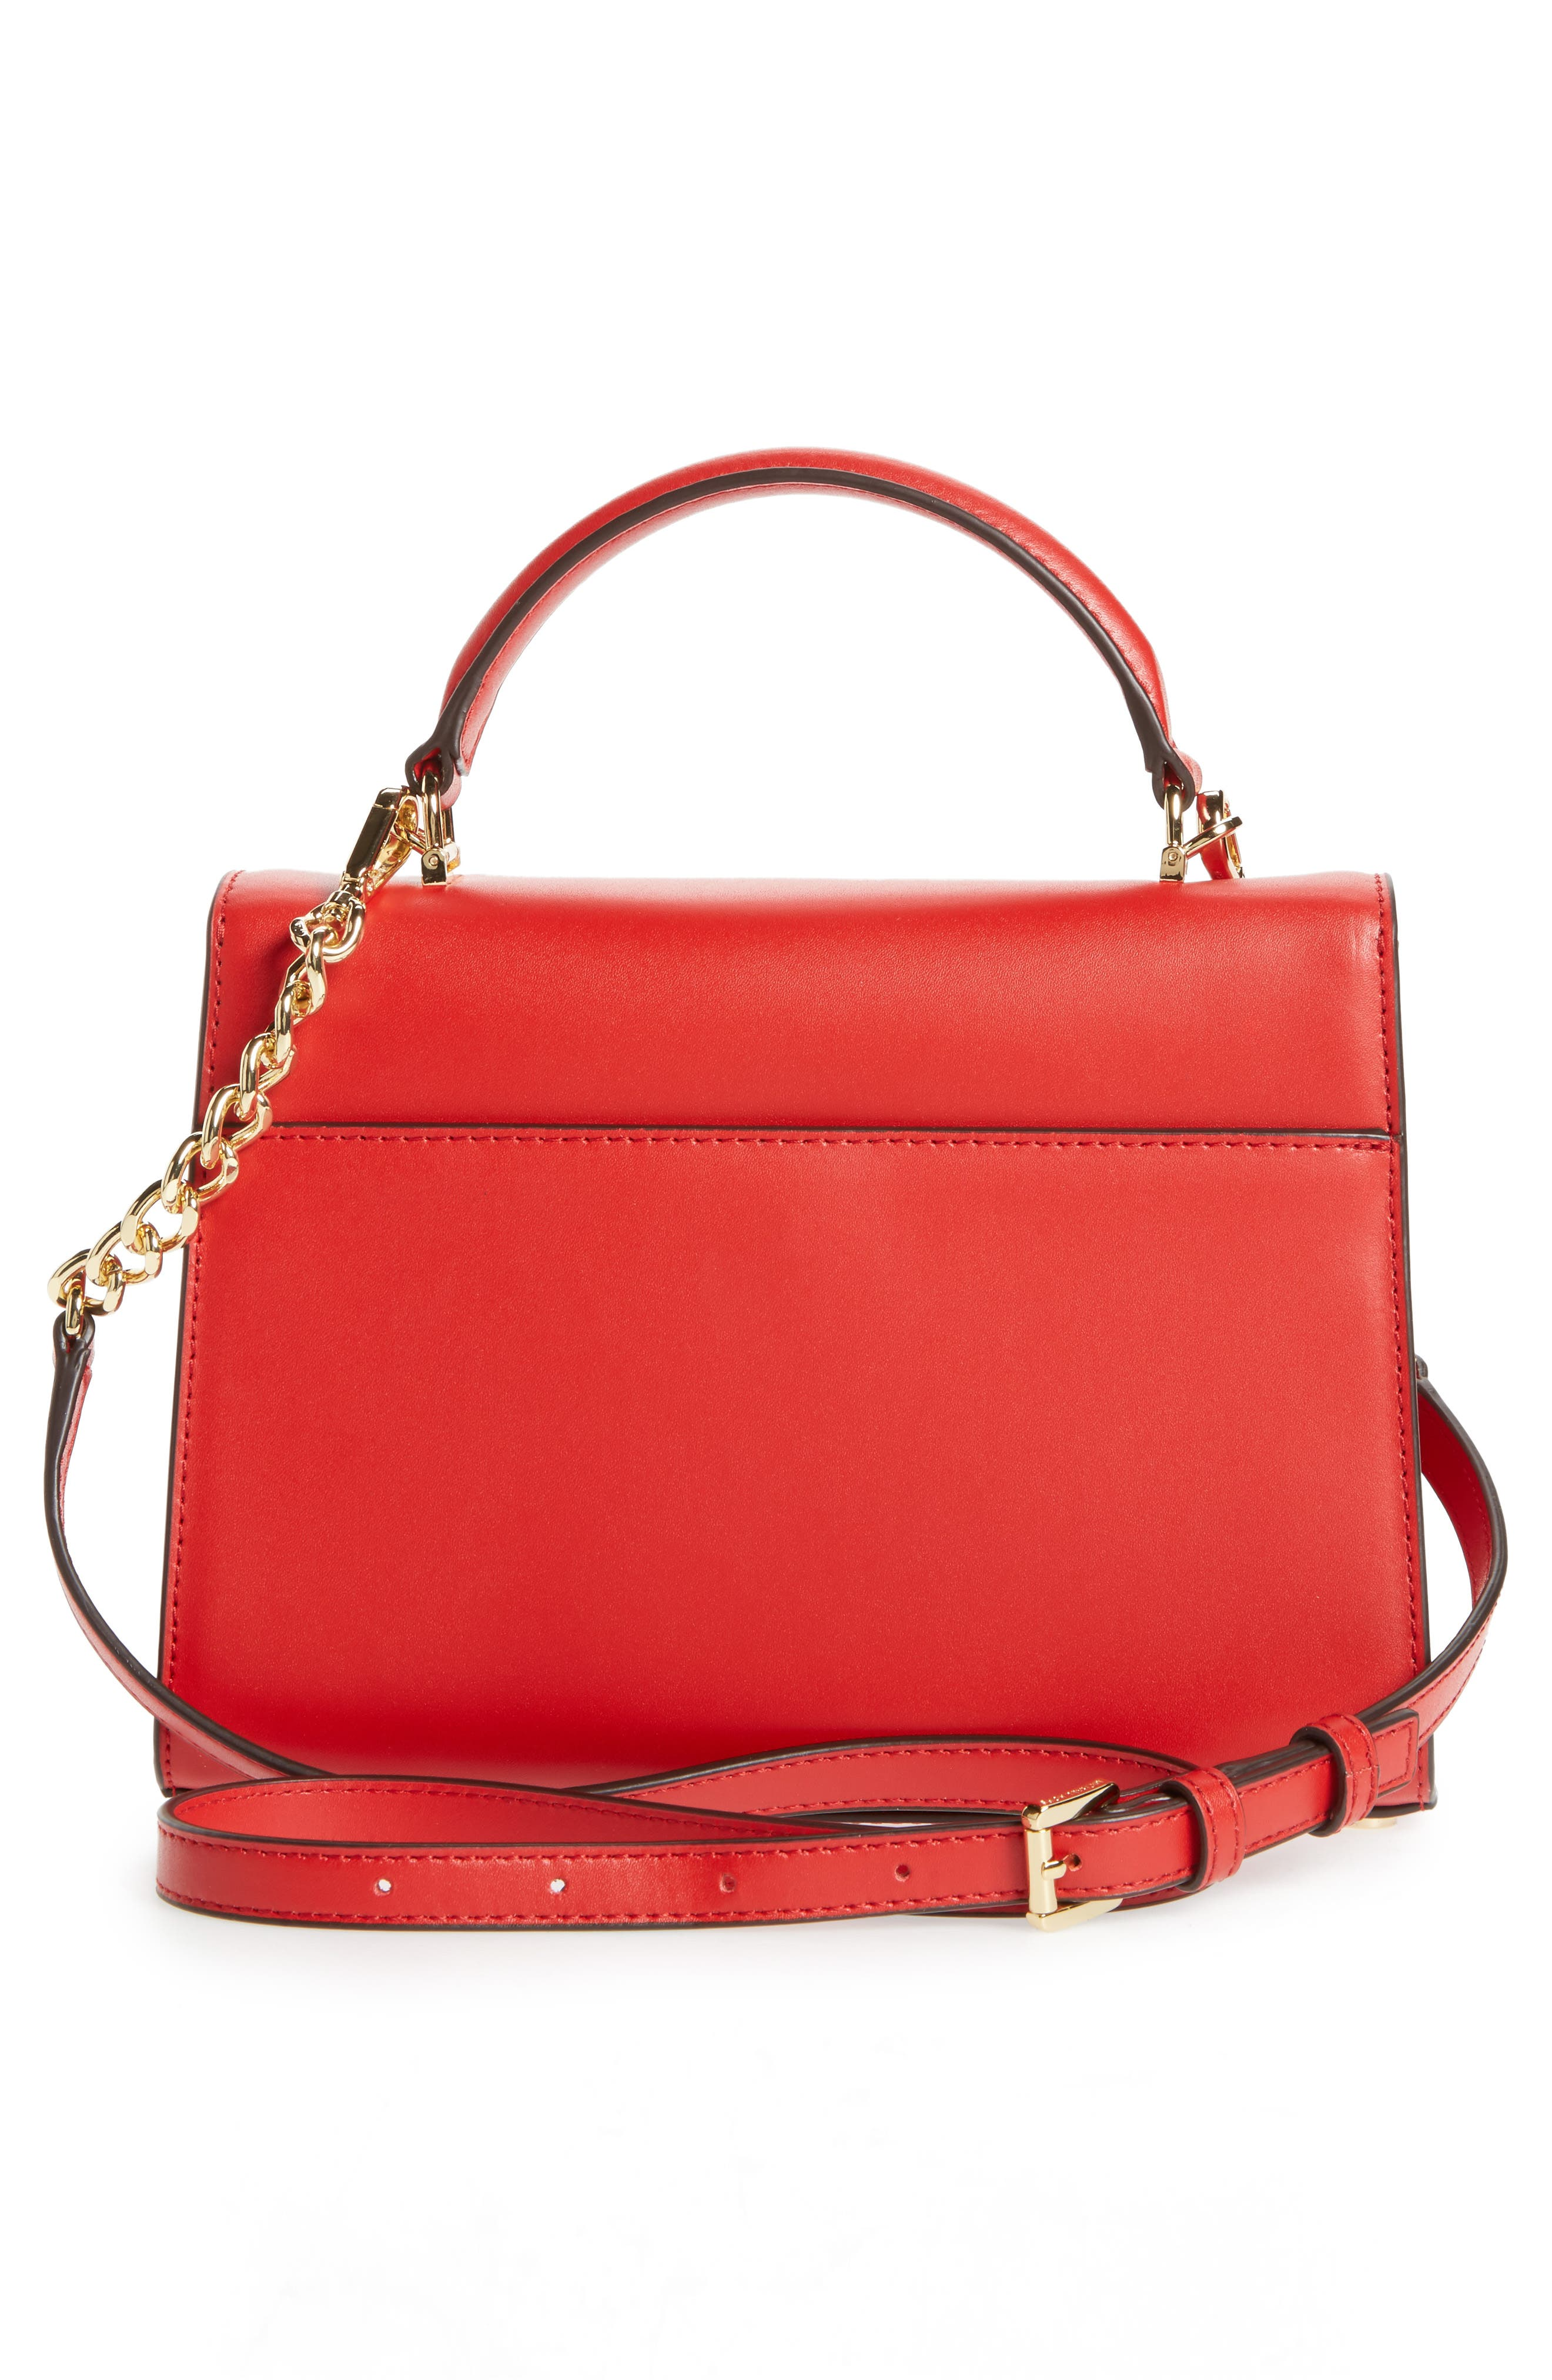 MICHAEL Michael Kors Medium Sloan Leather Satchel,                             Alternate thumbnail 3, color,                             Bright Red